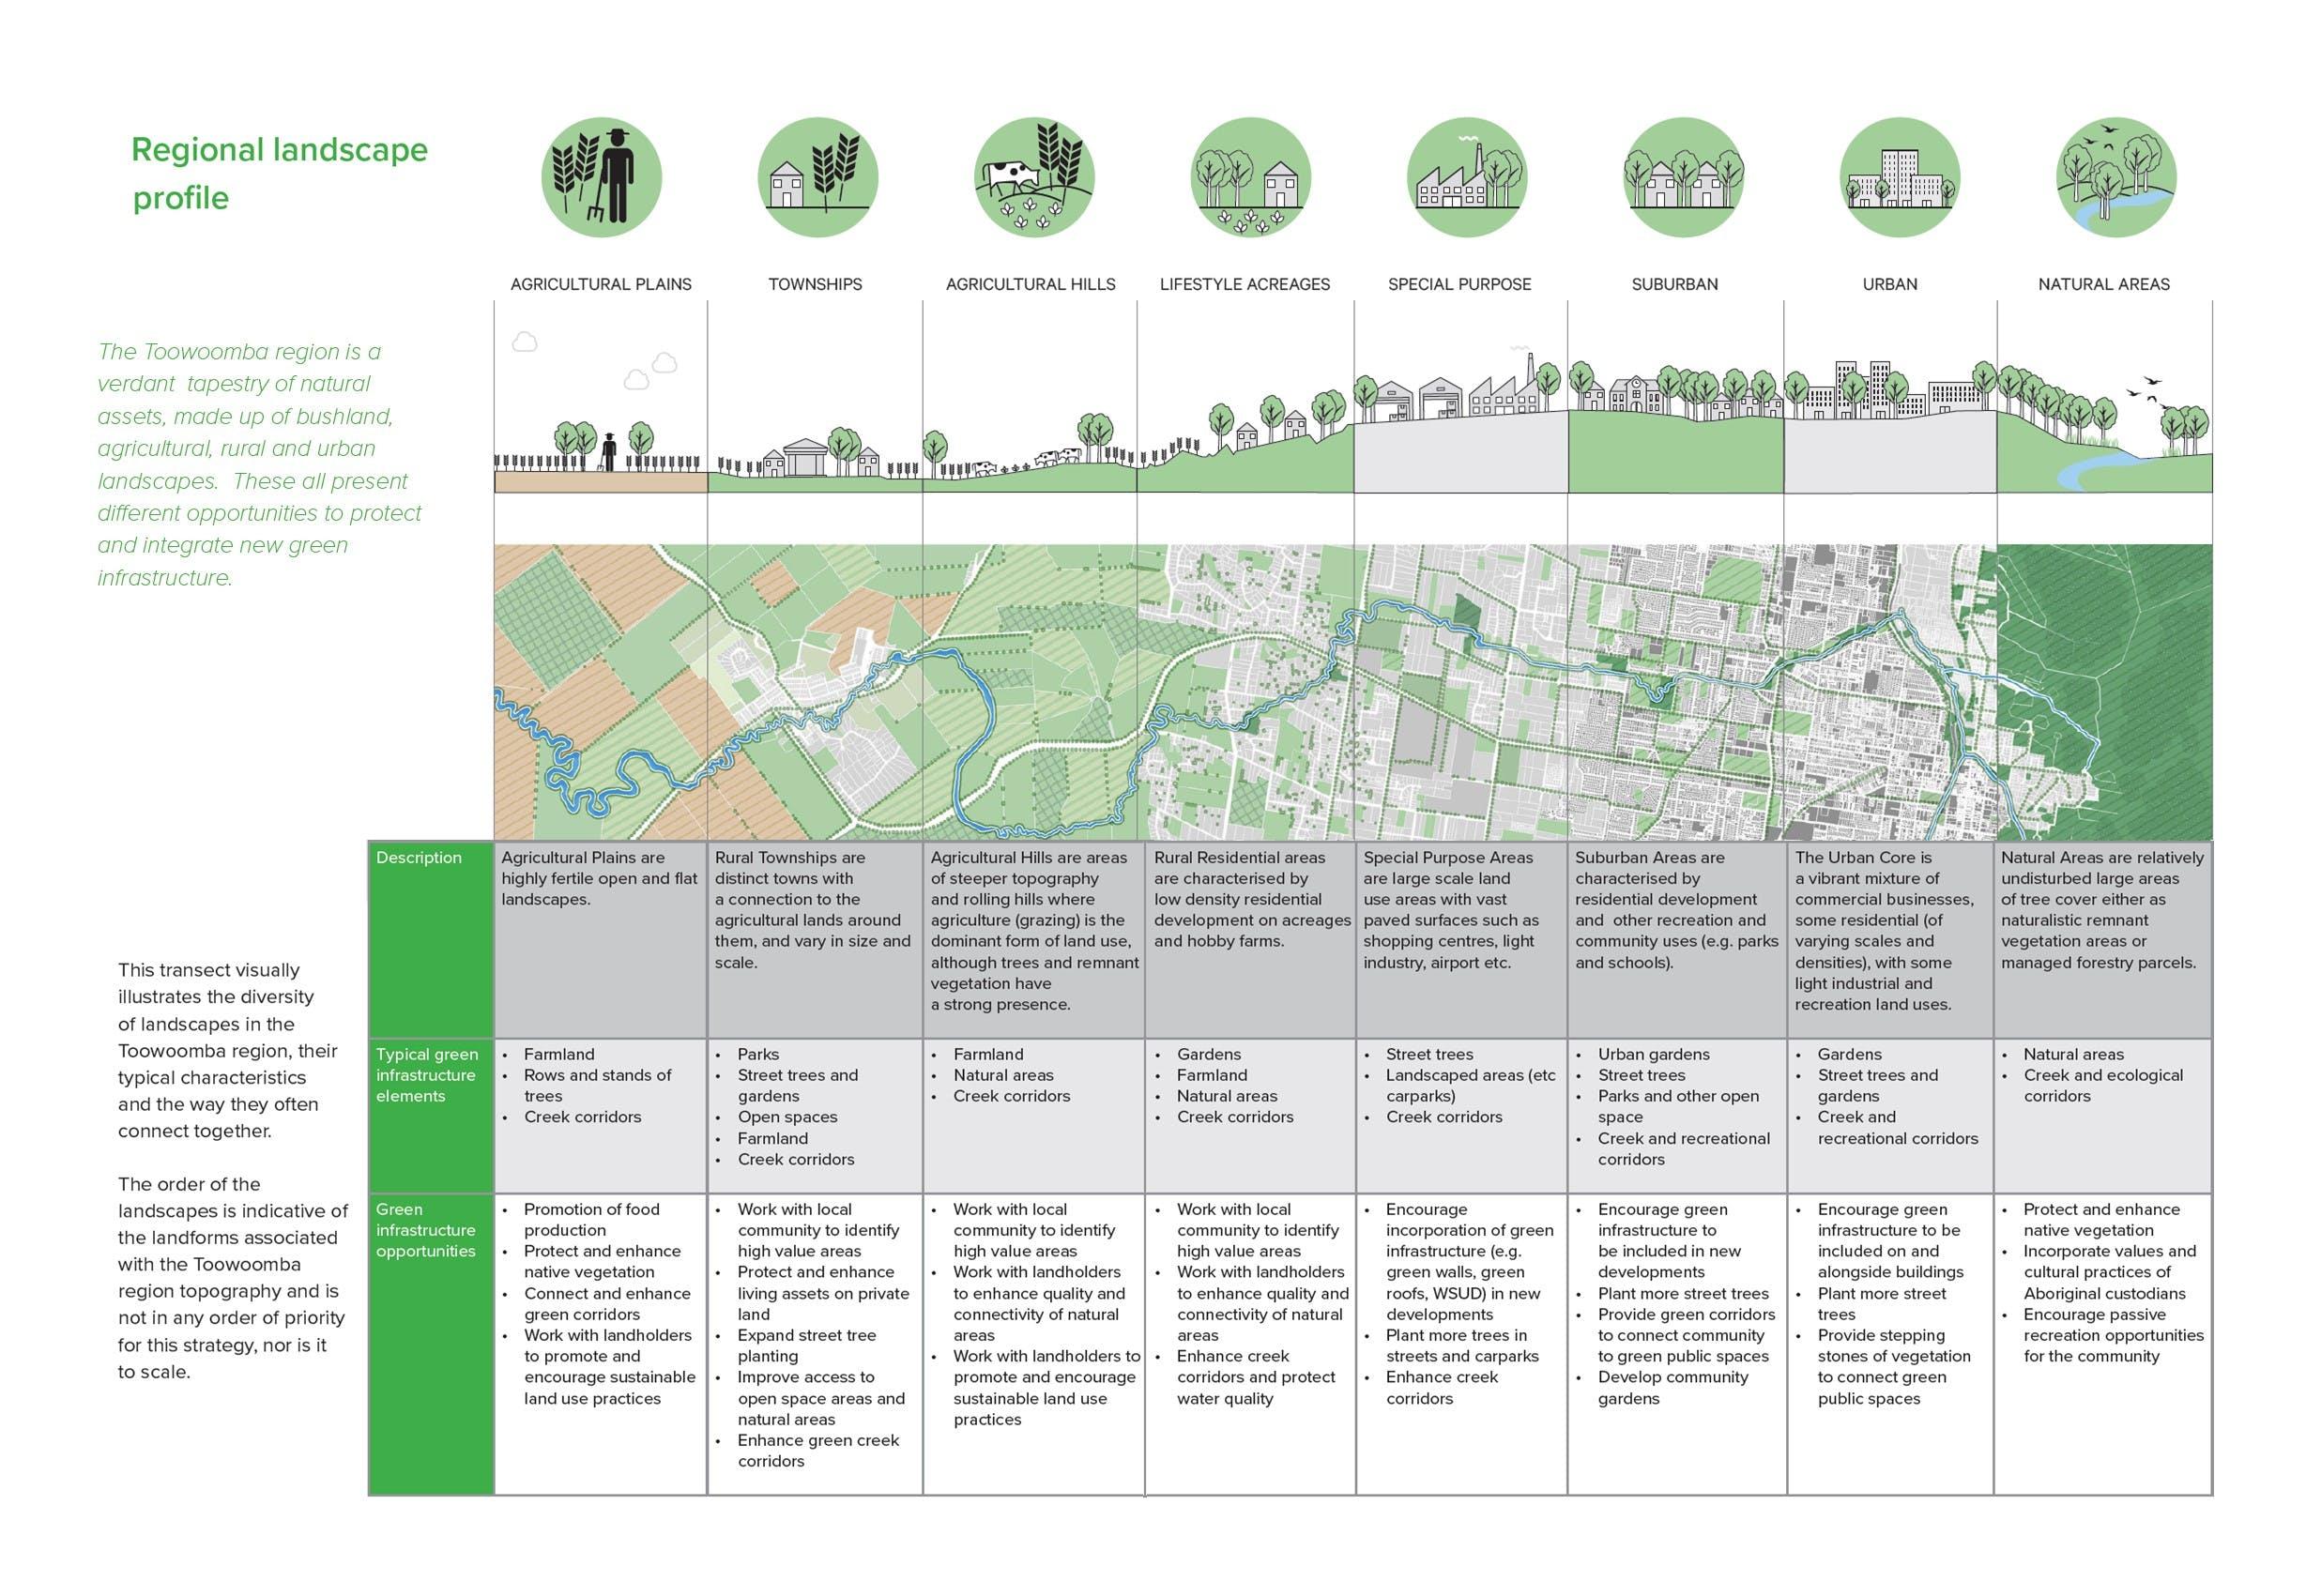 Regional Landscape Profile - full